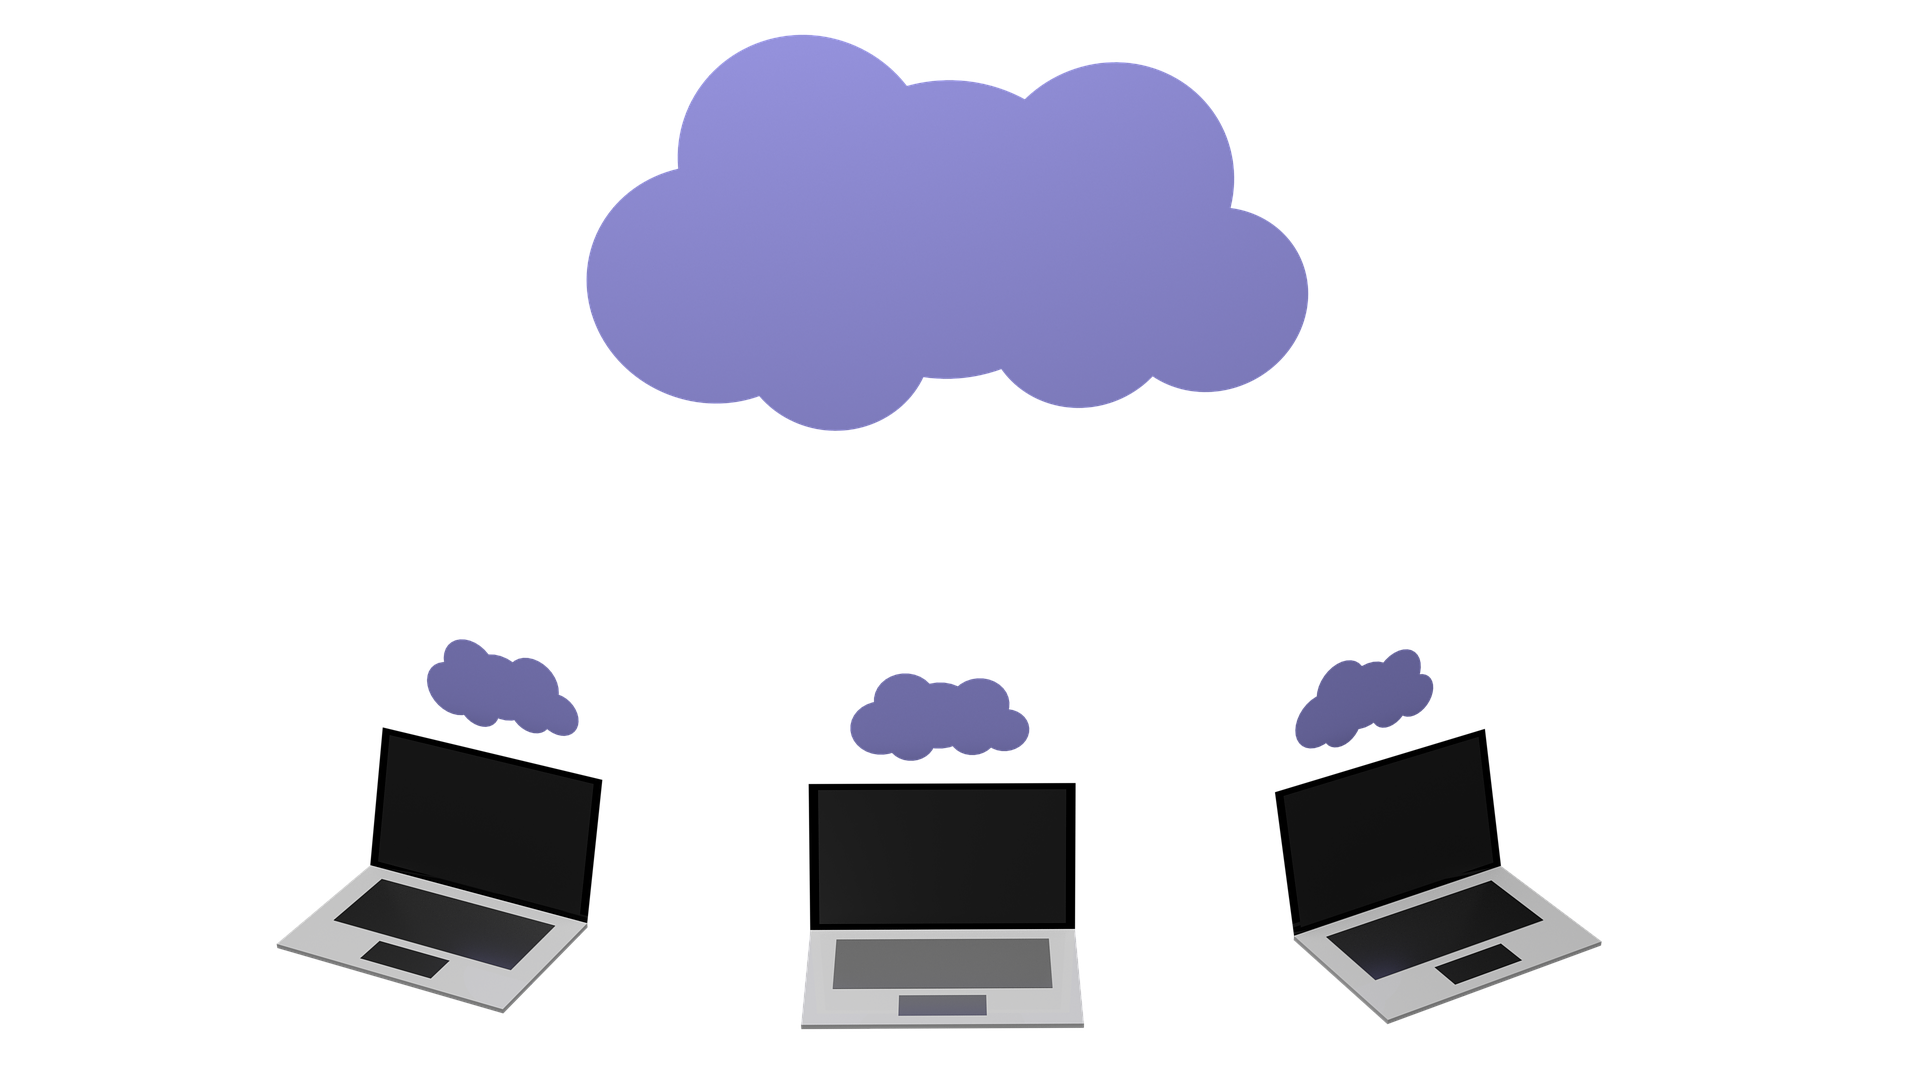 cloud-computing-1484538_1920.png